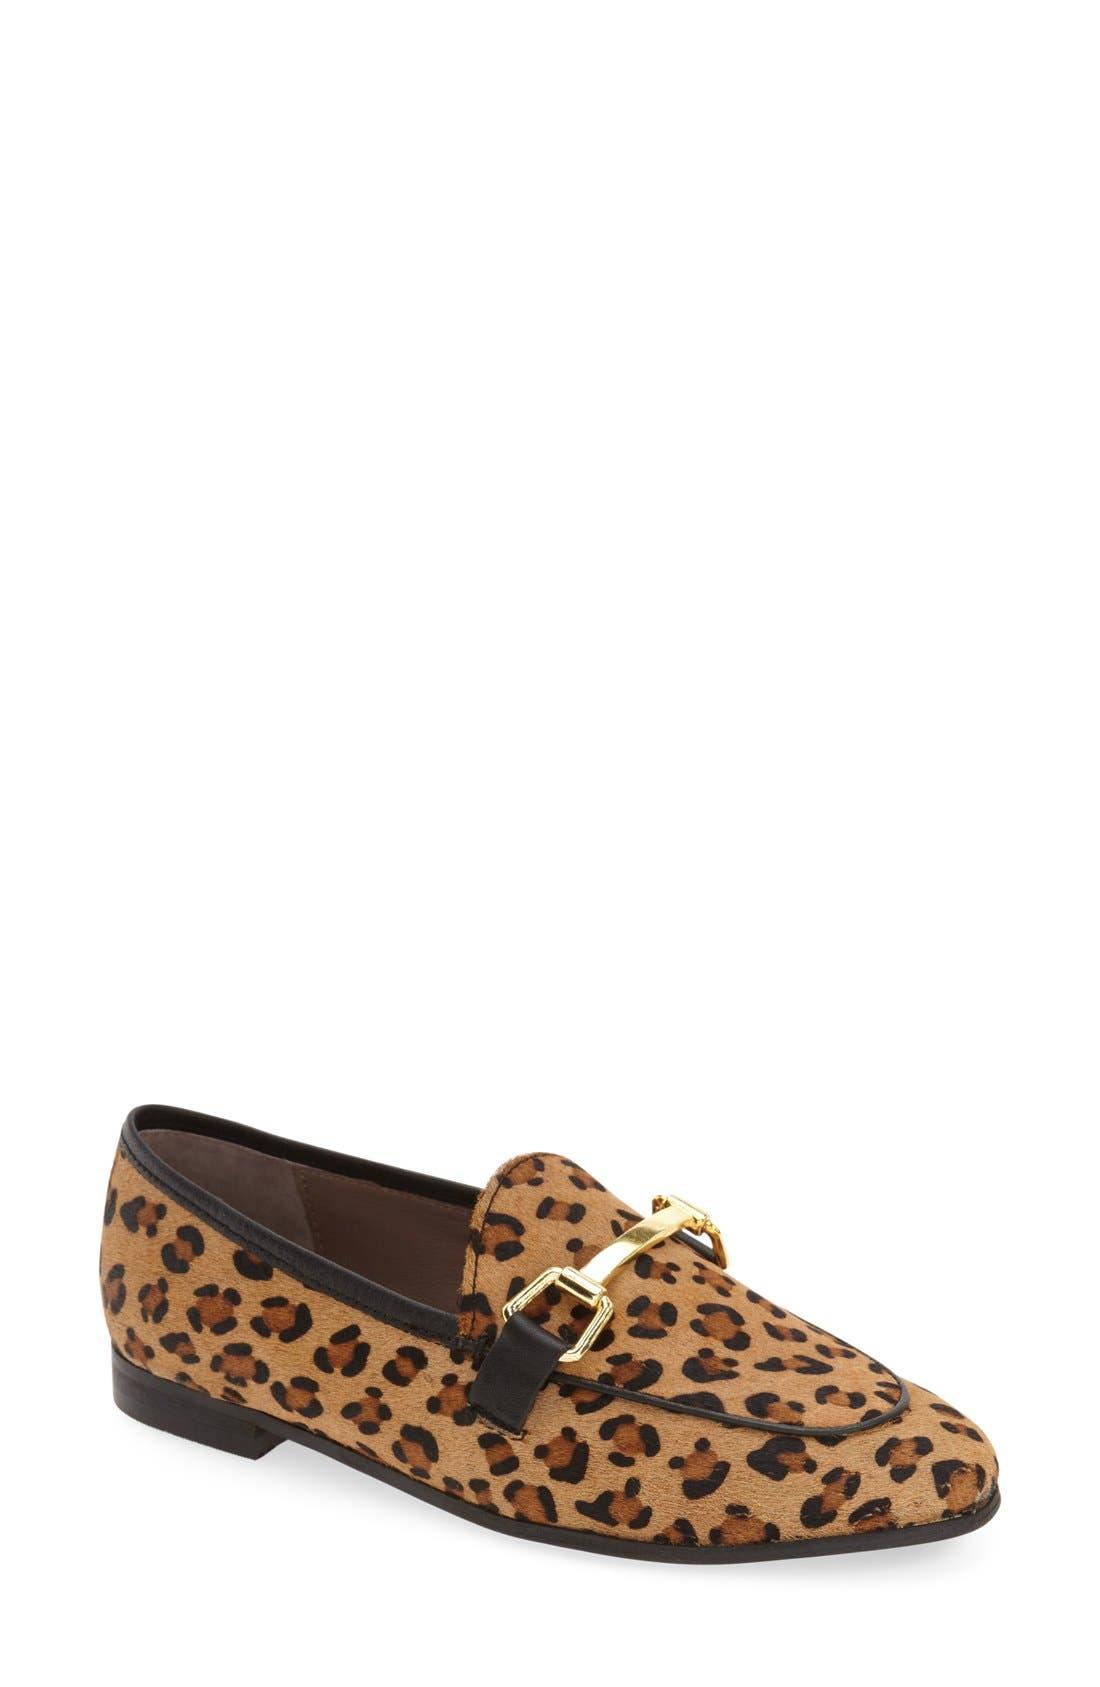 Main Image - Topshop 'Kendall' Genuine Calf Hair Loafer (Women)